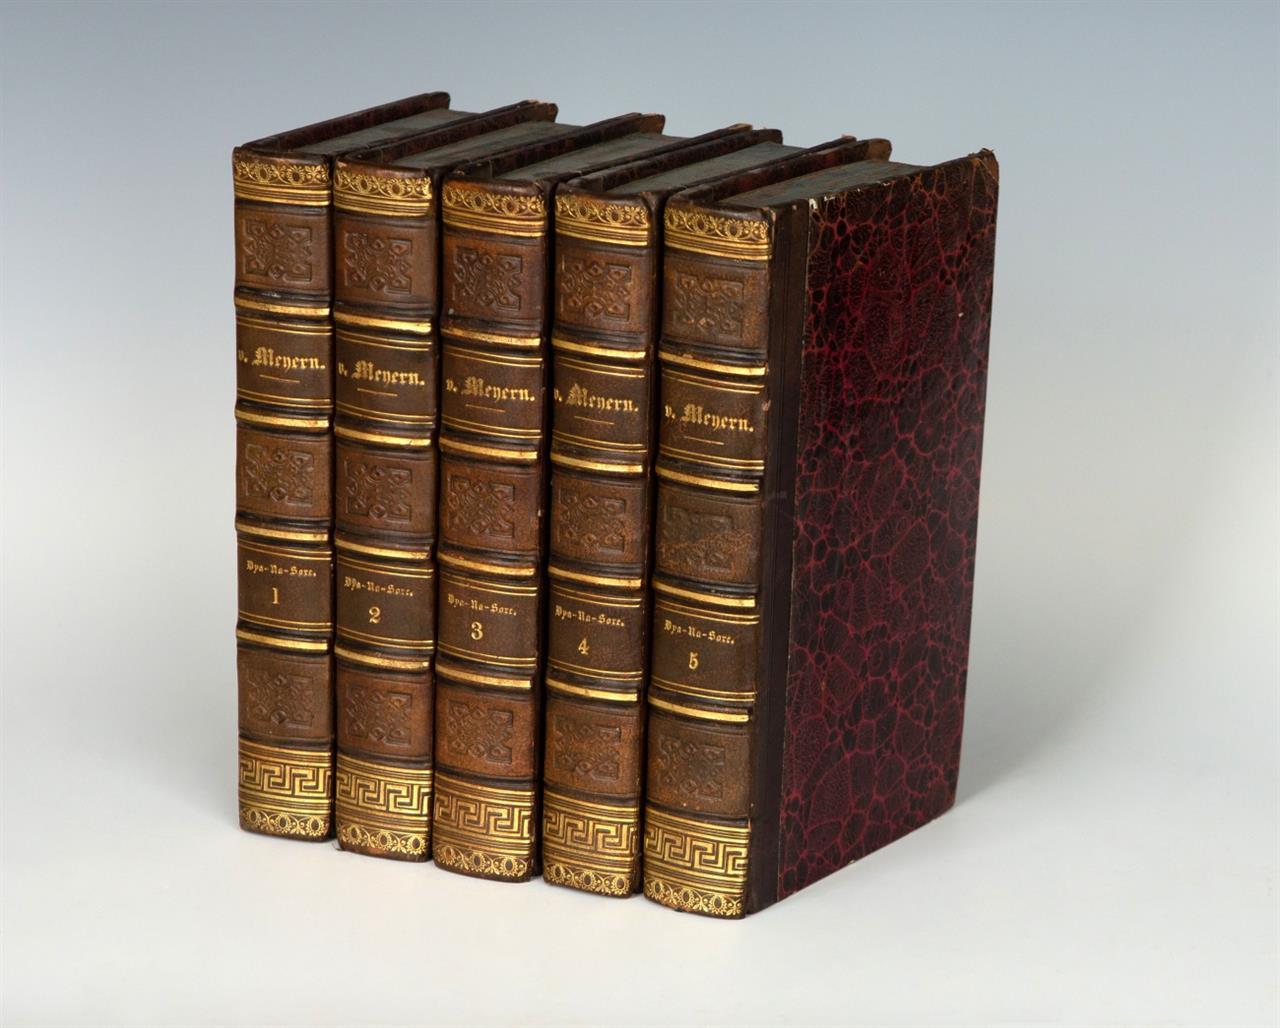 Meyern, W. F. v., Dya-Na-Sore. 5 Bde. Lpz. 1800.